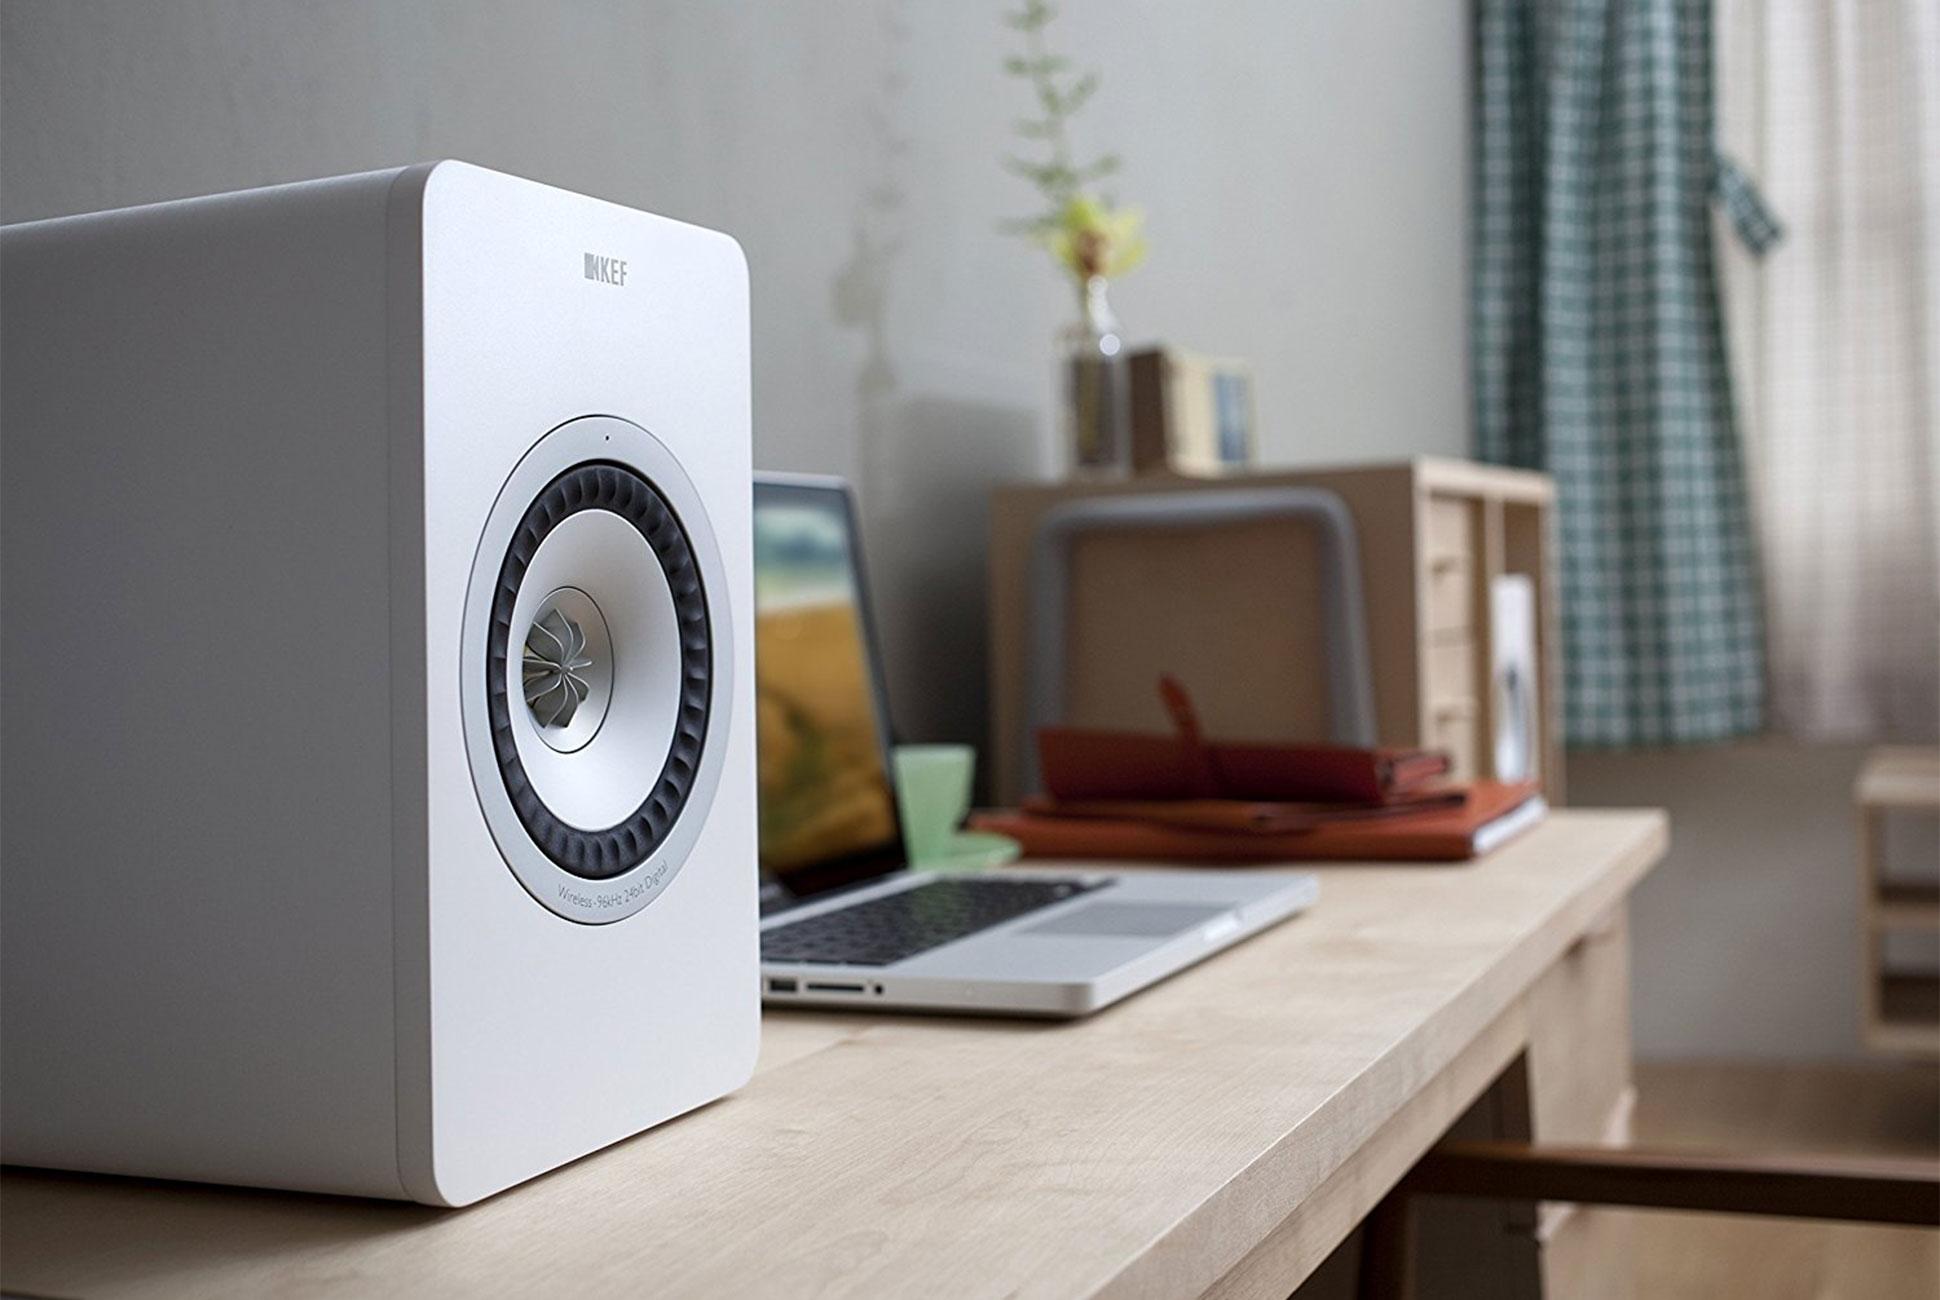 Sonos Isn't The Only Great Multi-Room Speaker System - Gear Patrol